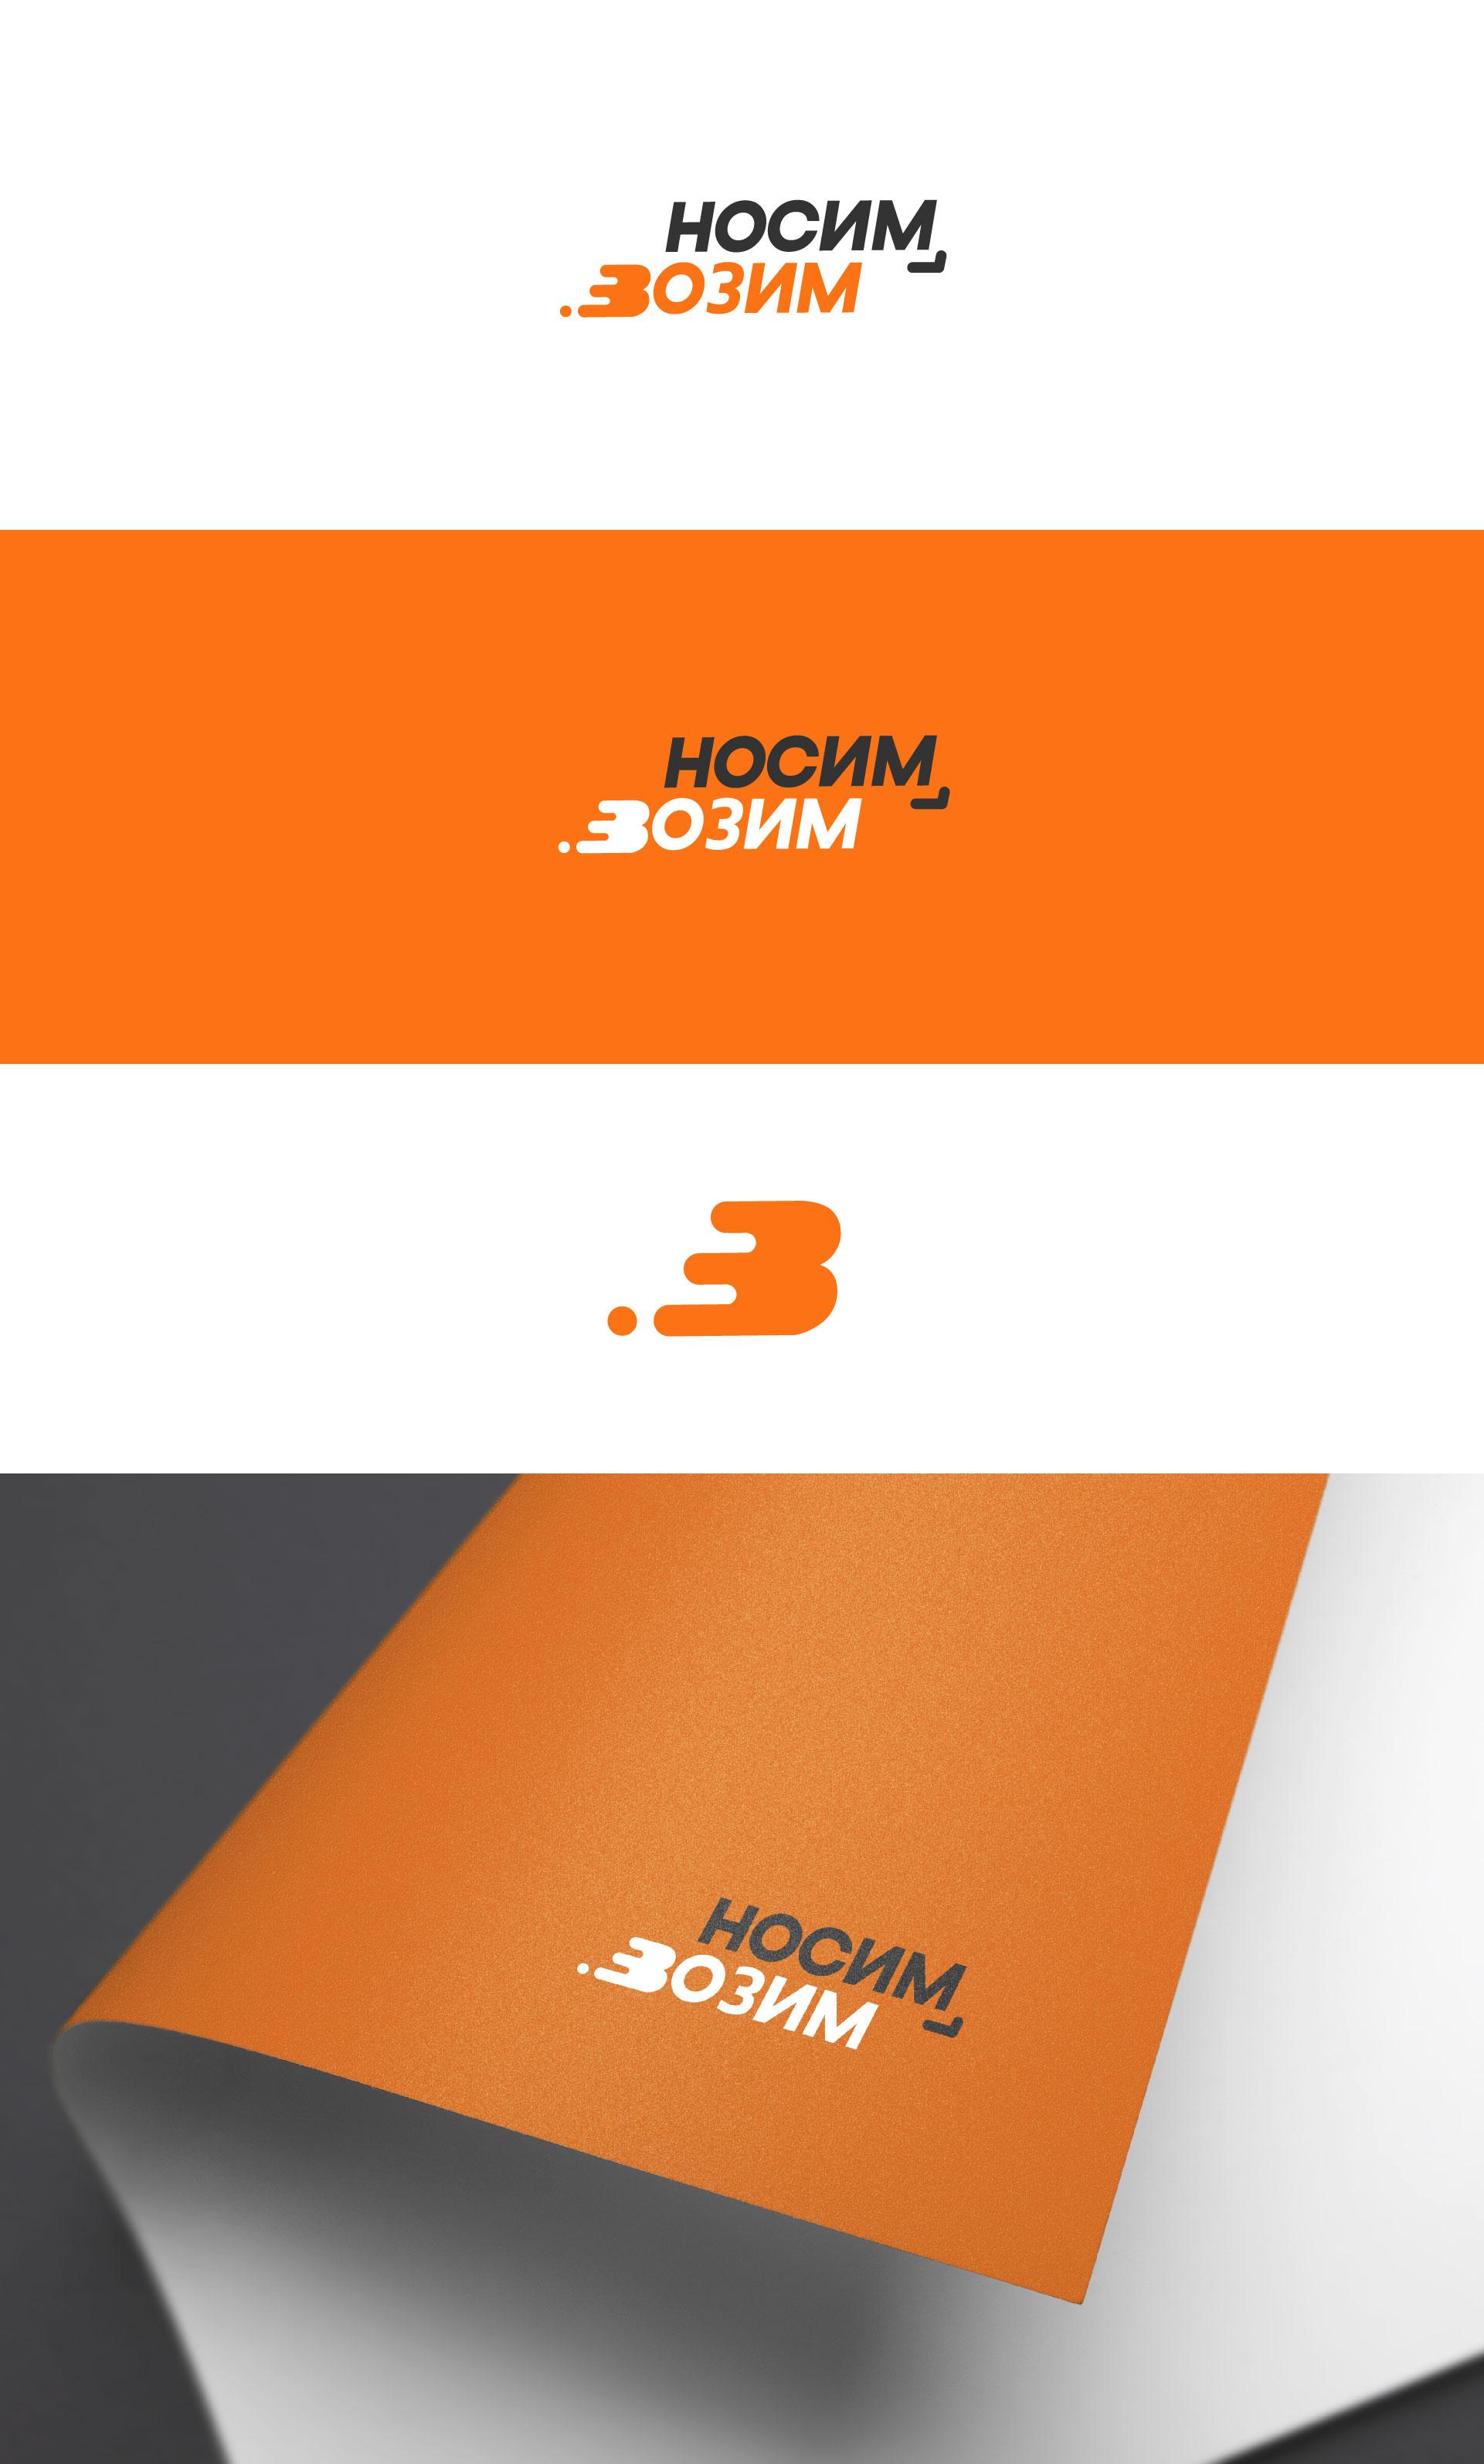 Логотип компании по перевозкам НосимВозим фото f_3795cf9742bdcca6.jpg